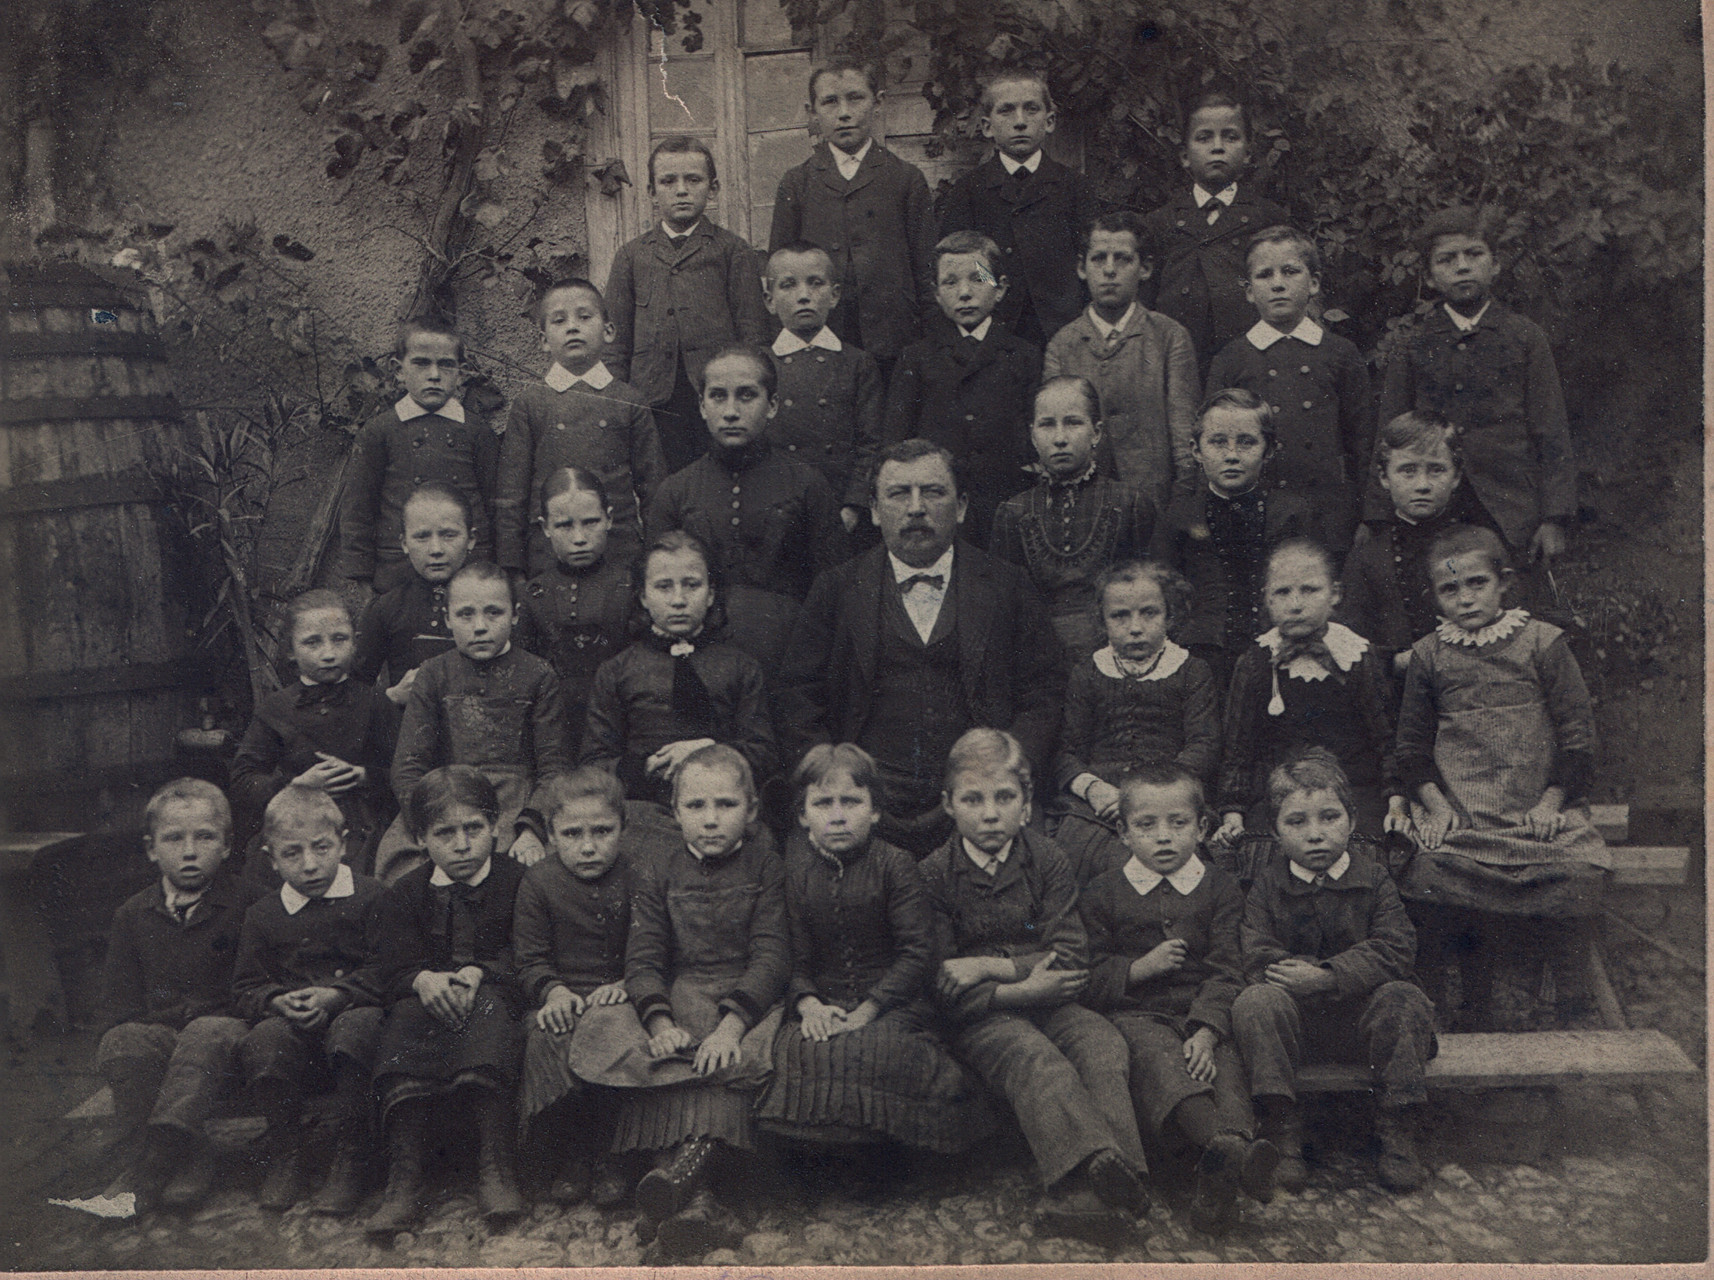 Jahrgang 1878, Bild: Laupus,Gisela